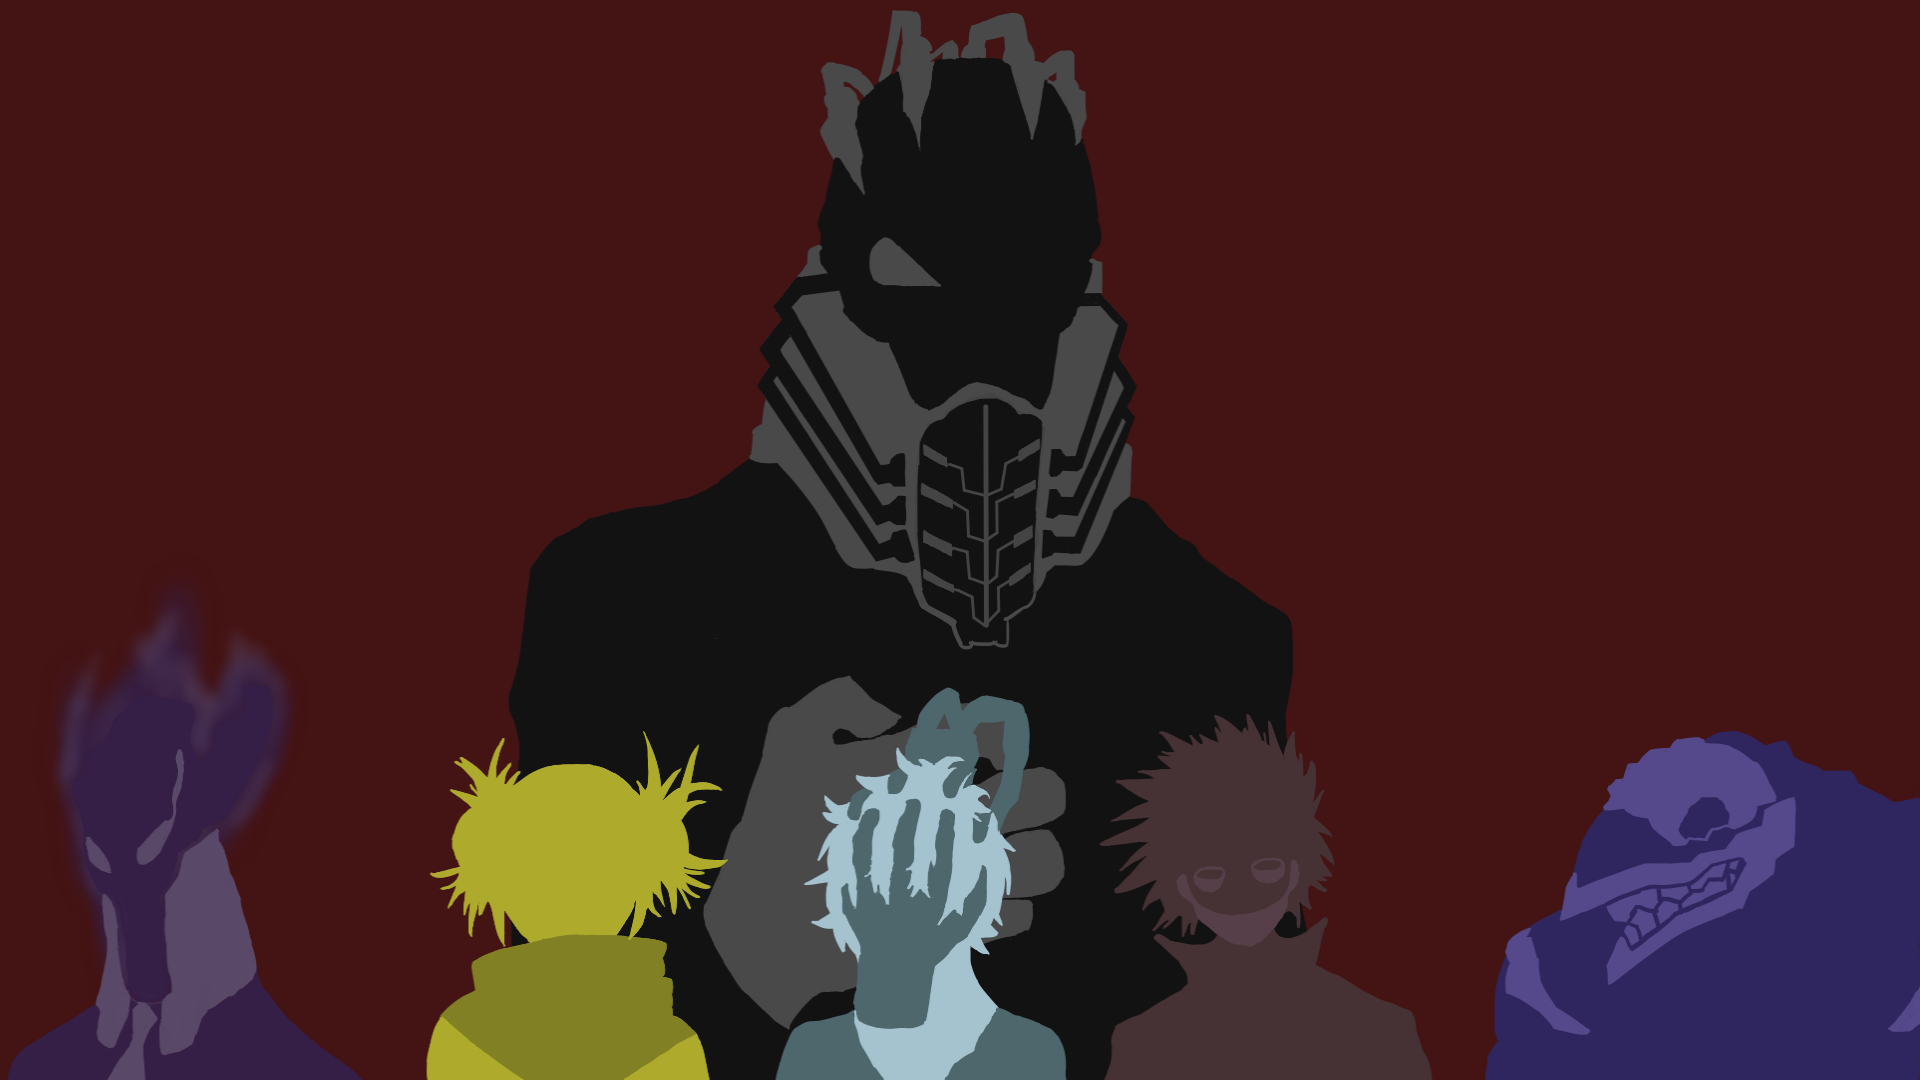 Second wallpaper made now with villains BokuNoHeroAcademia 1920x1080